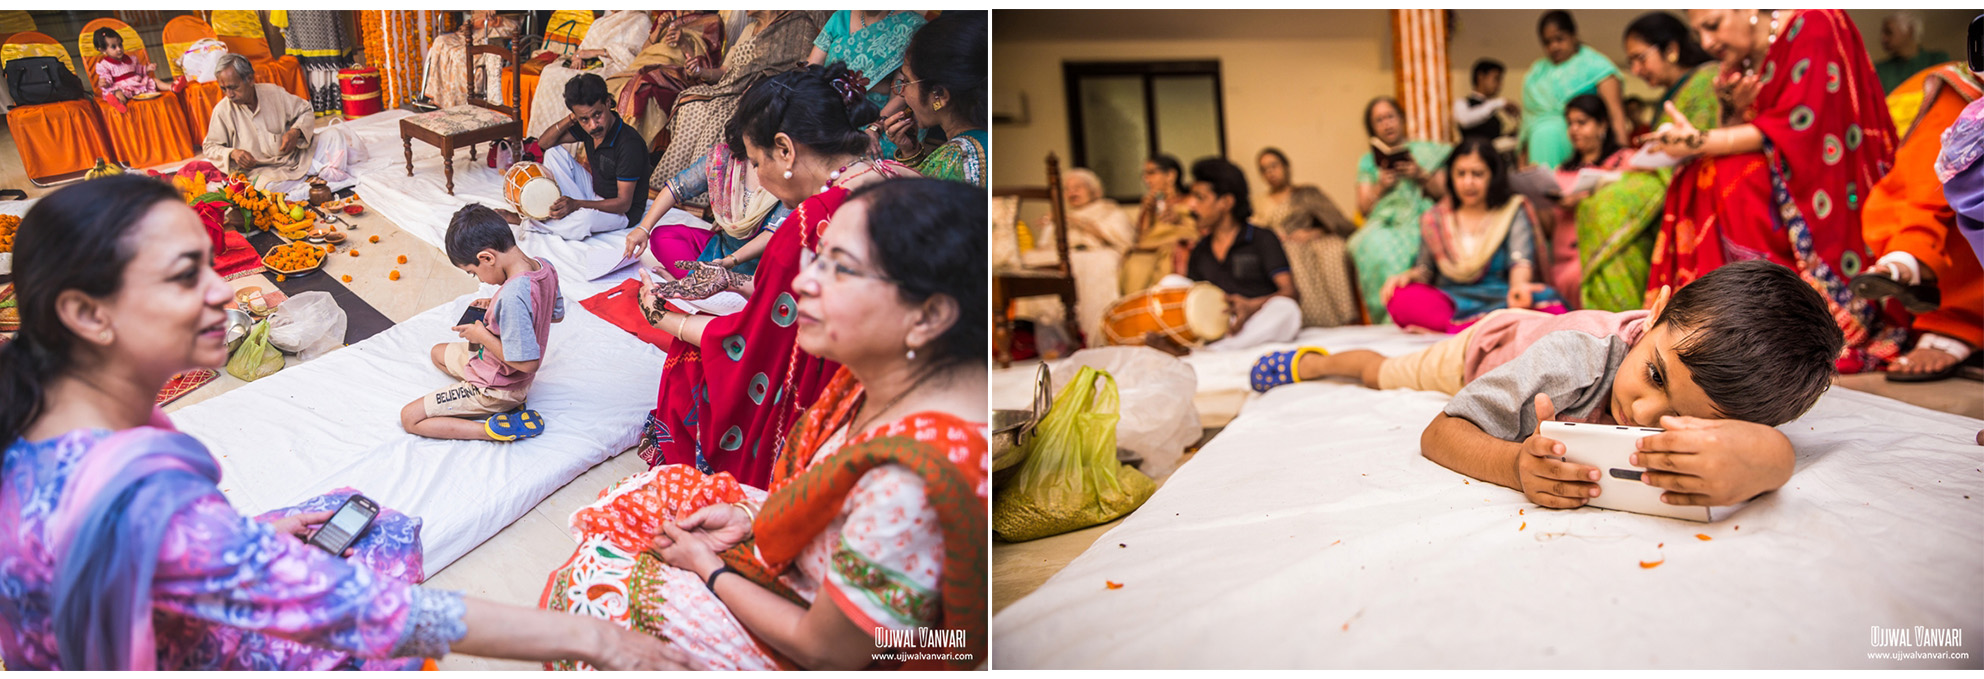 Wedding Photographer in Lucknow | Mannat & Rishabh Lucknow Wedding | Candid Wedding Photography